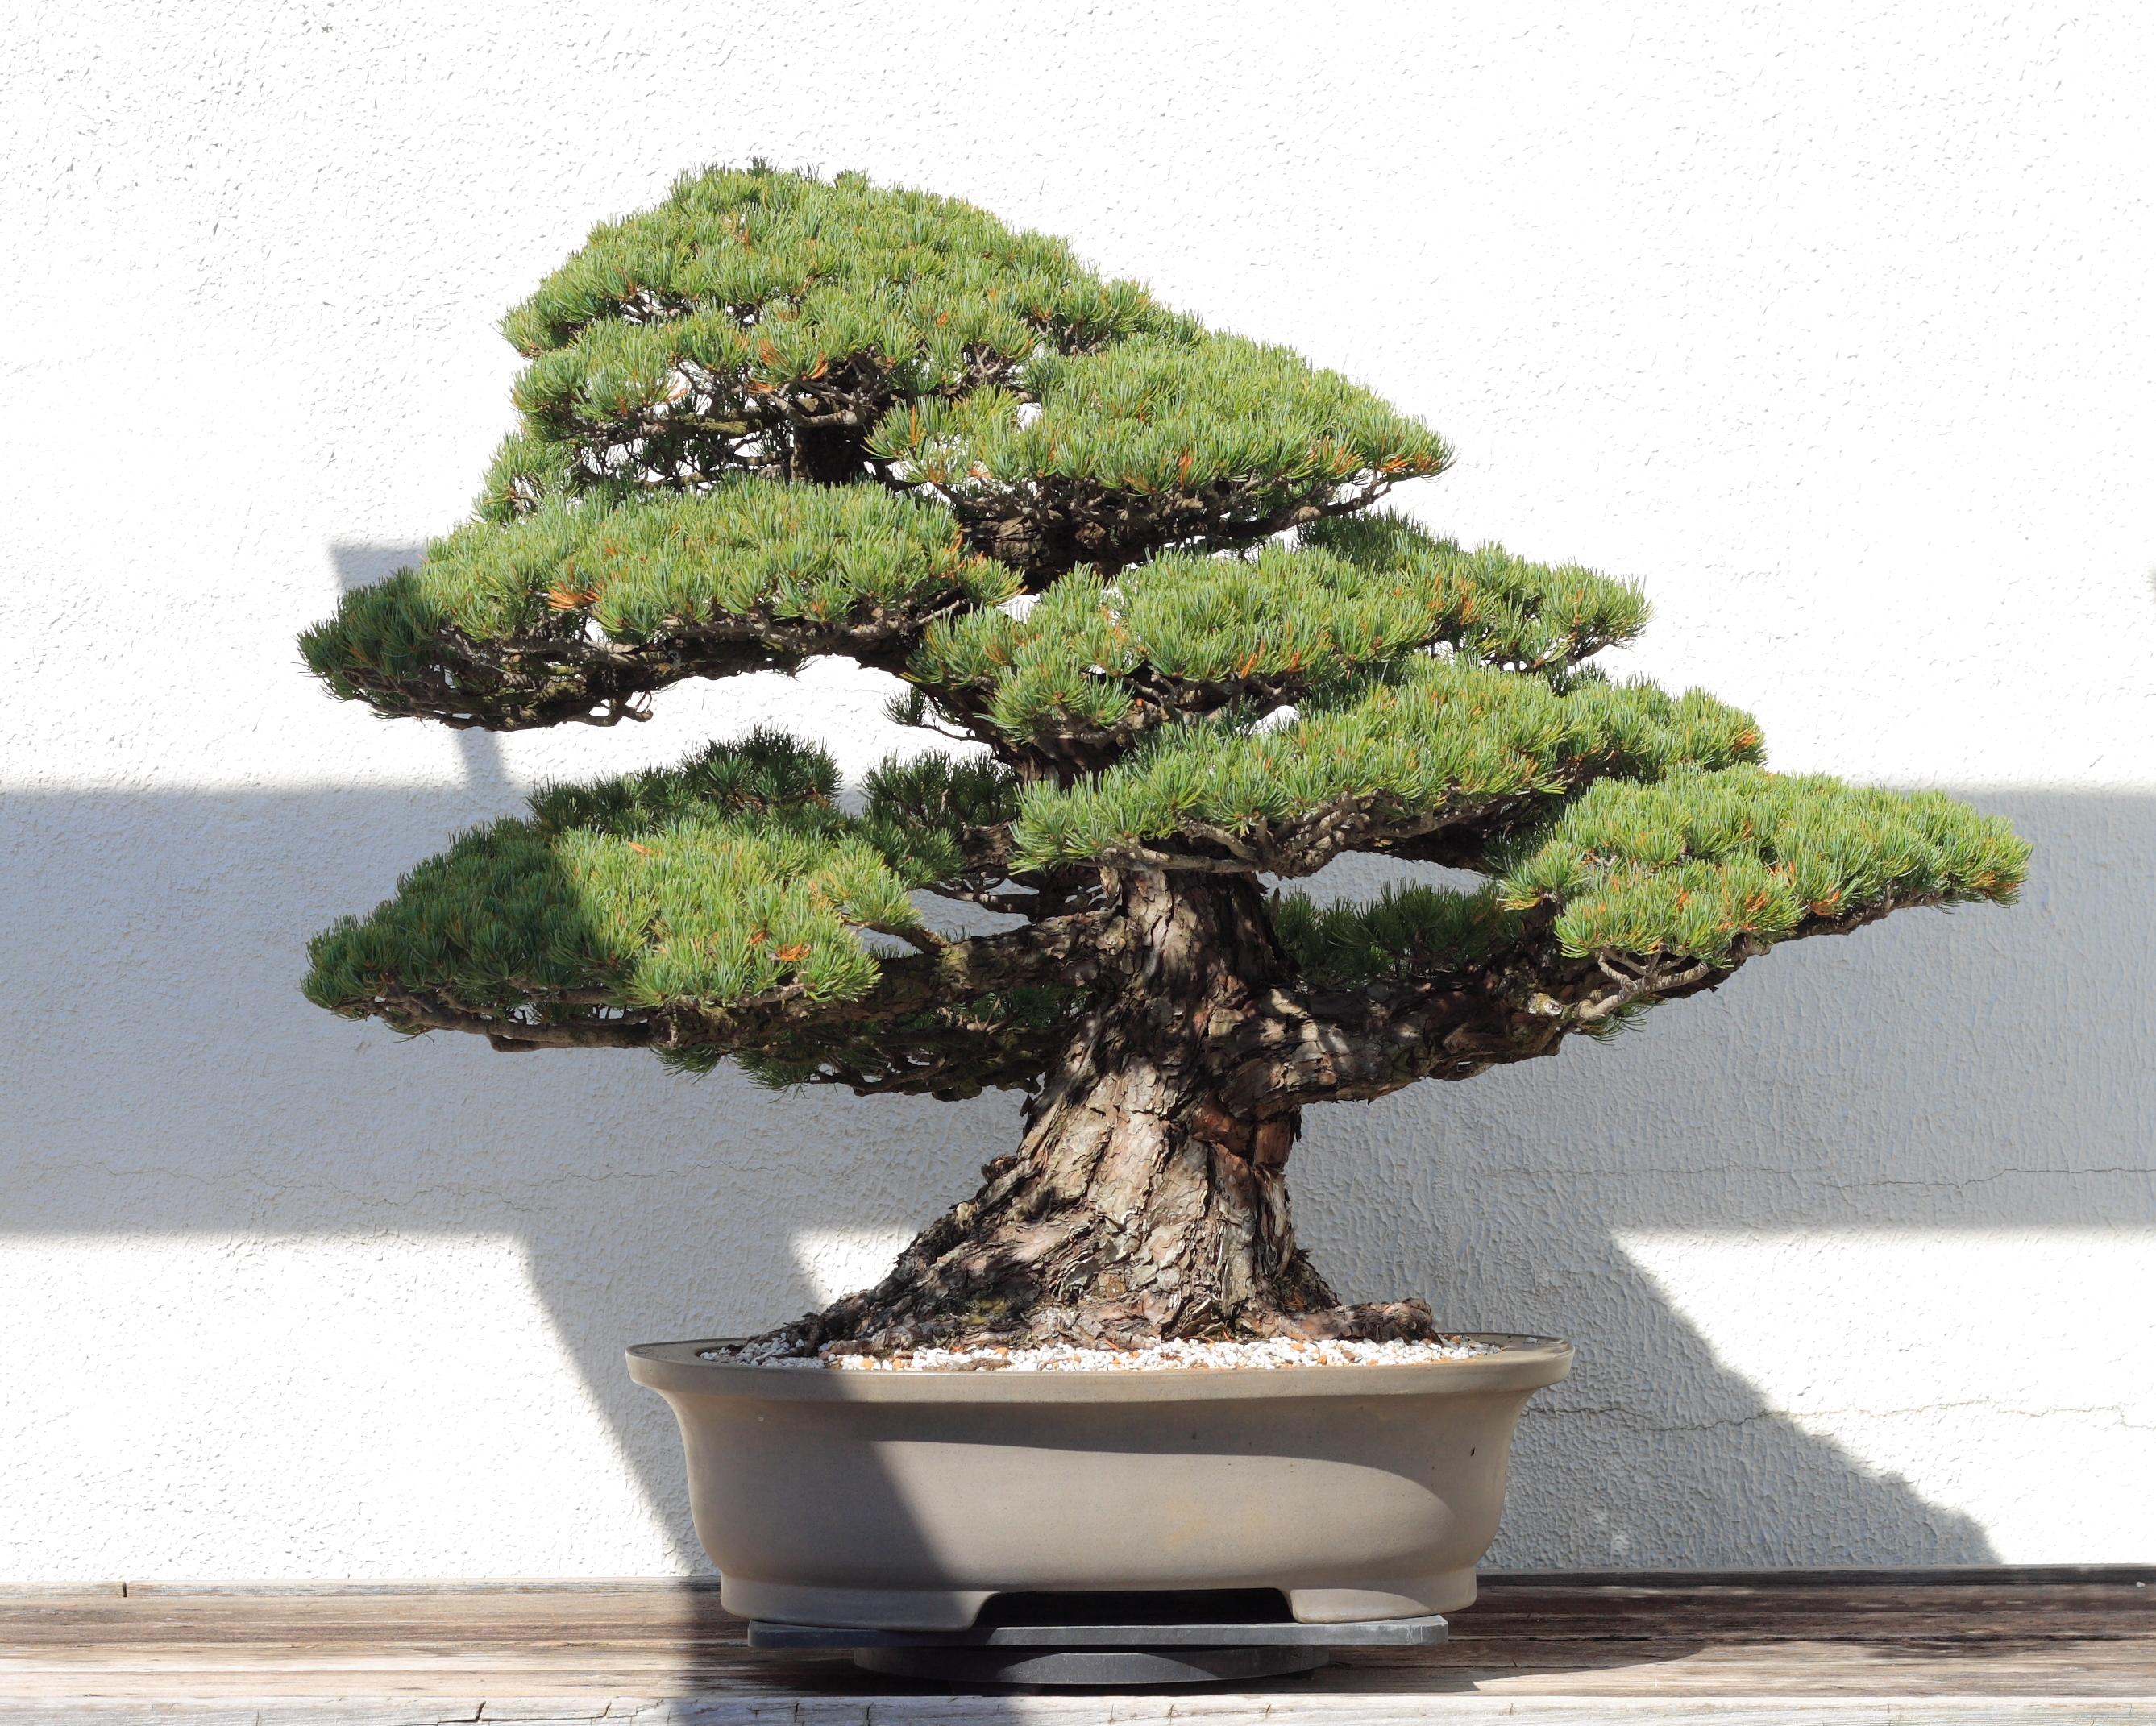 Description Japanese White Pine Bonsai 81  October 10  2008